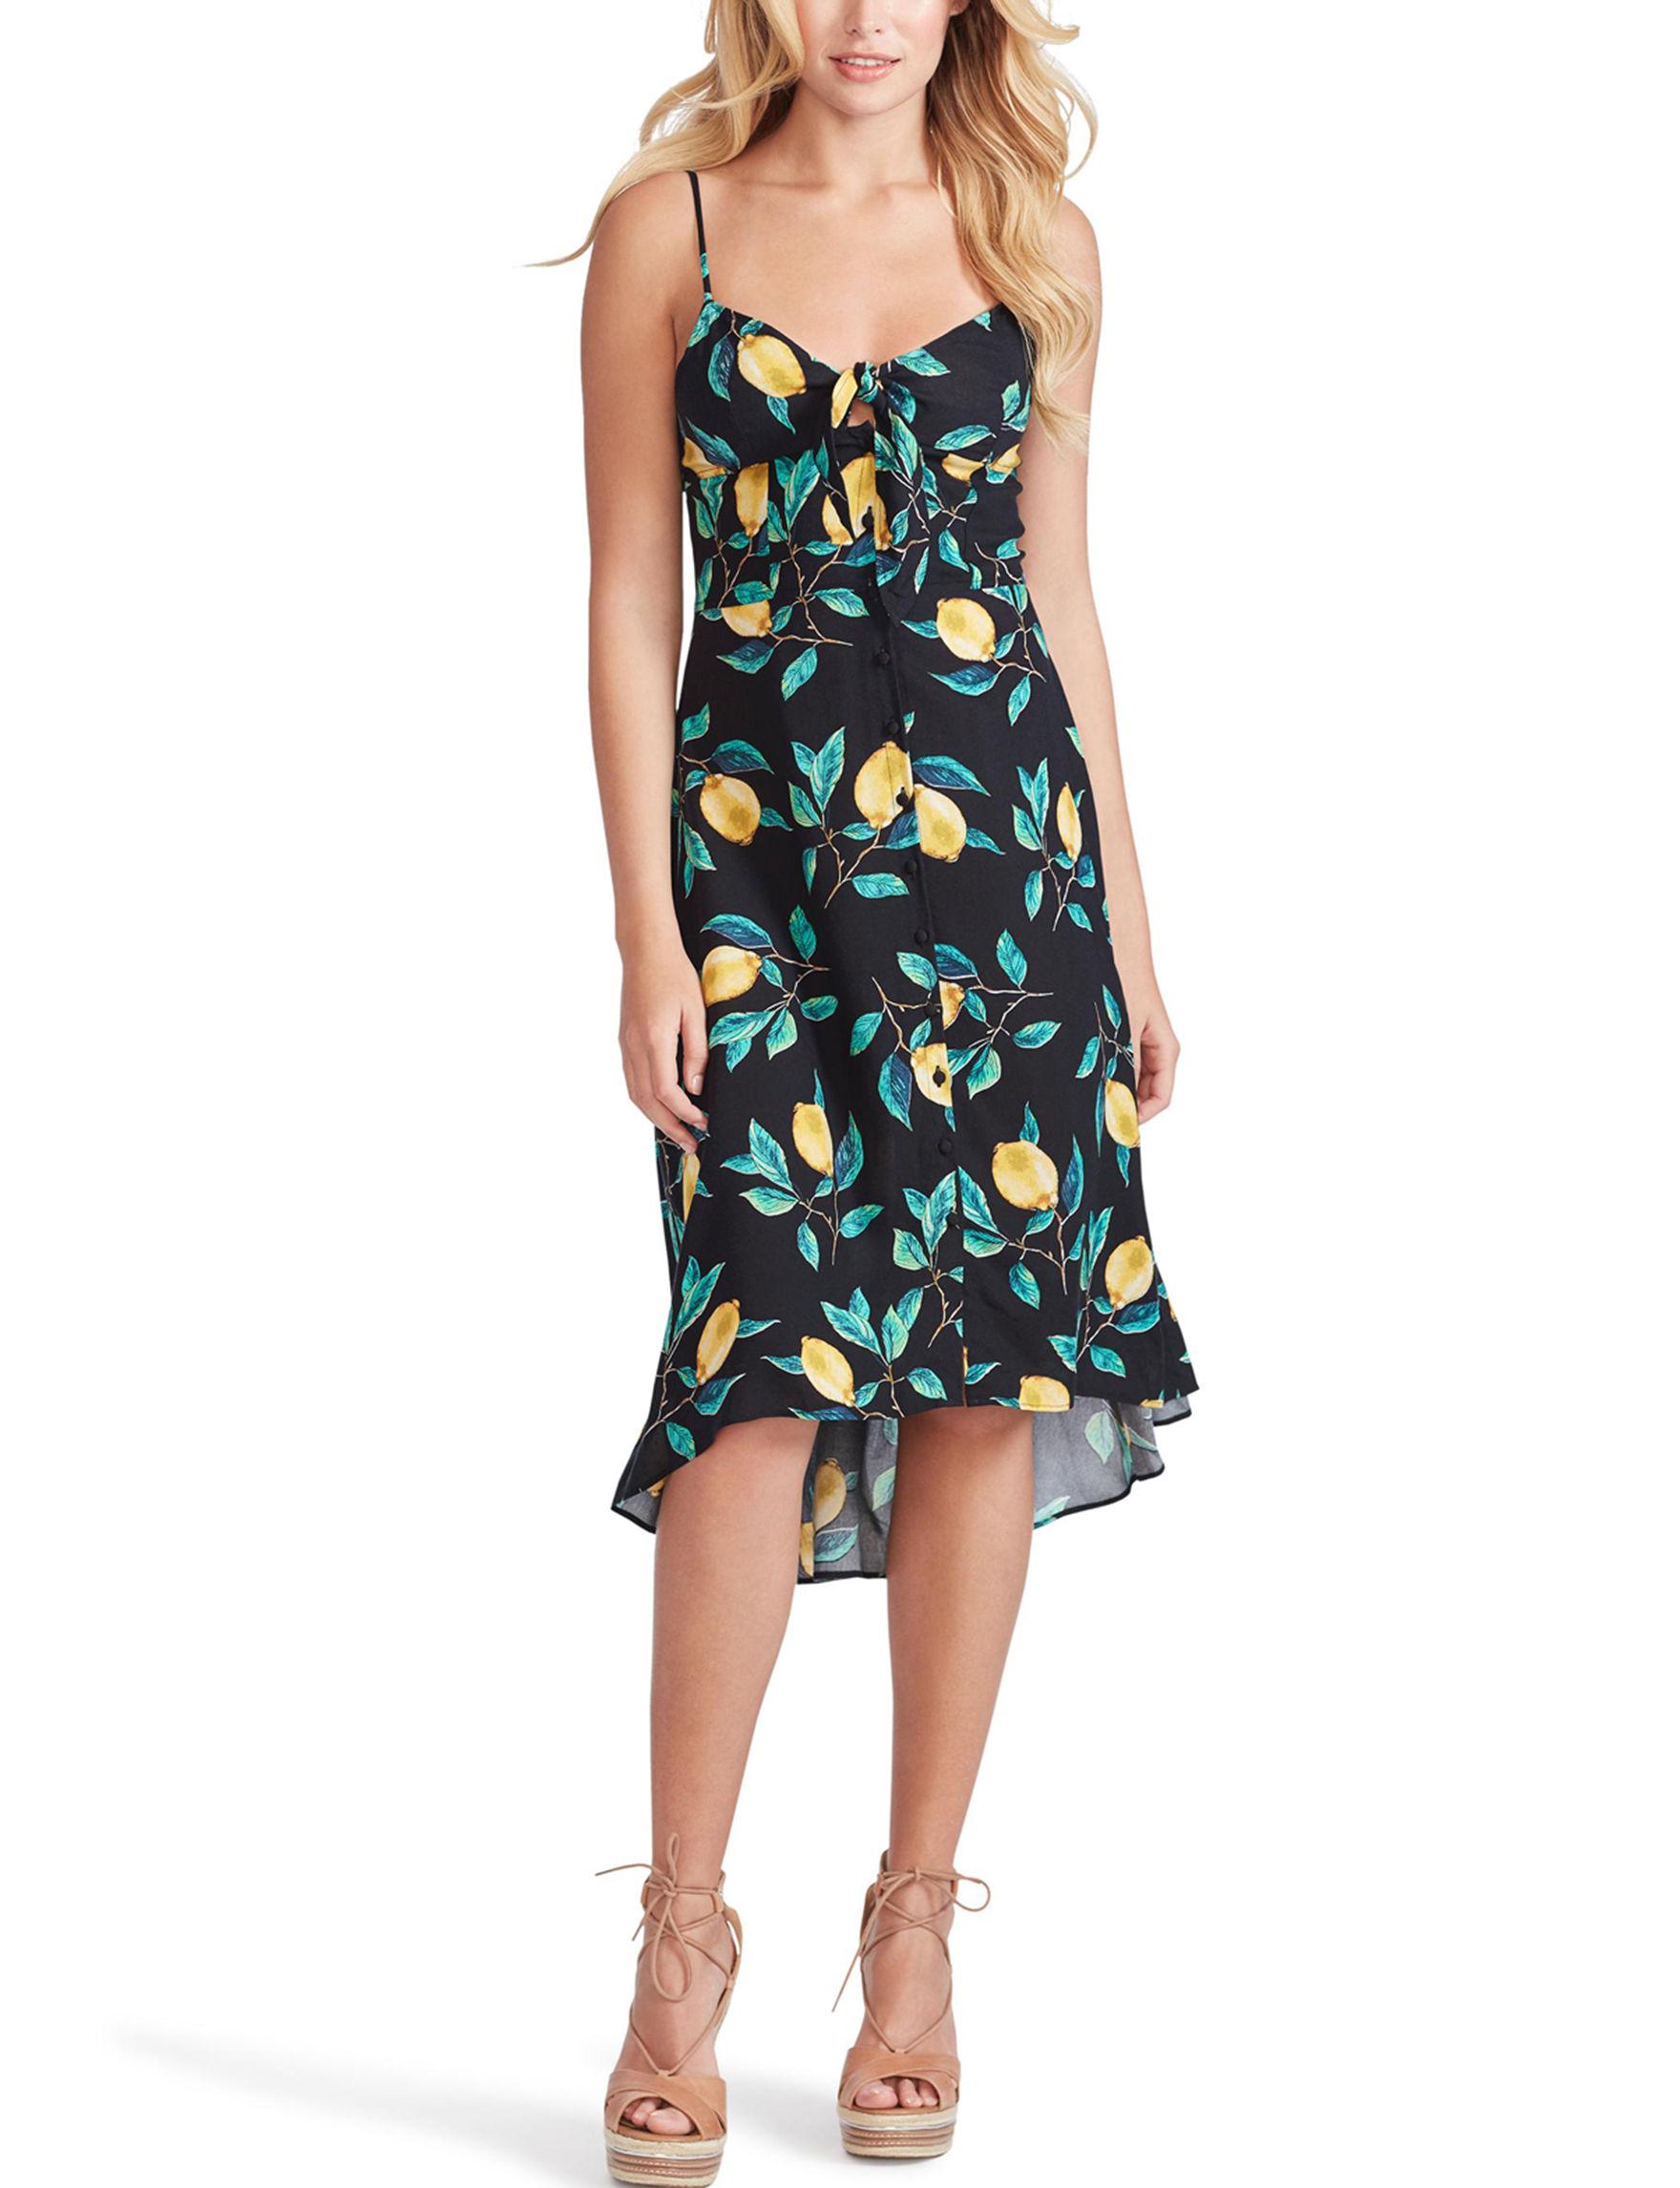 Jessica Simpson Black Everyday & Casual Sundresses